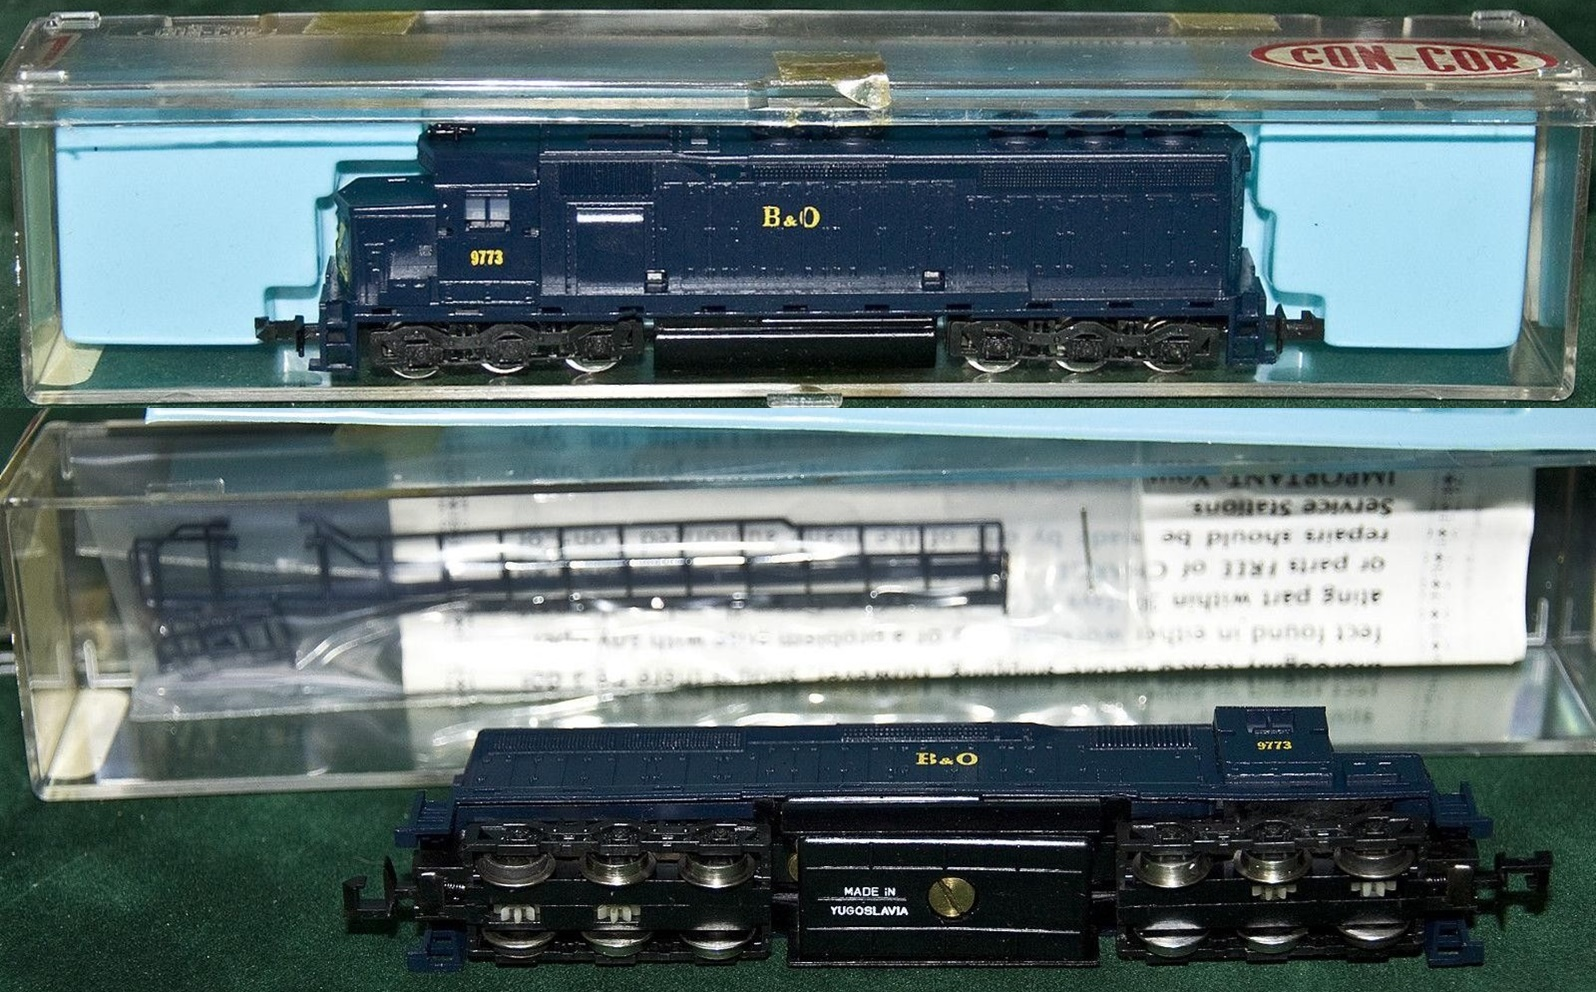 N Scale - Con-Cor - 2201-G - Locomotive, Diesel, EMD SD45 - Baltimore & Ohio - 9773